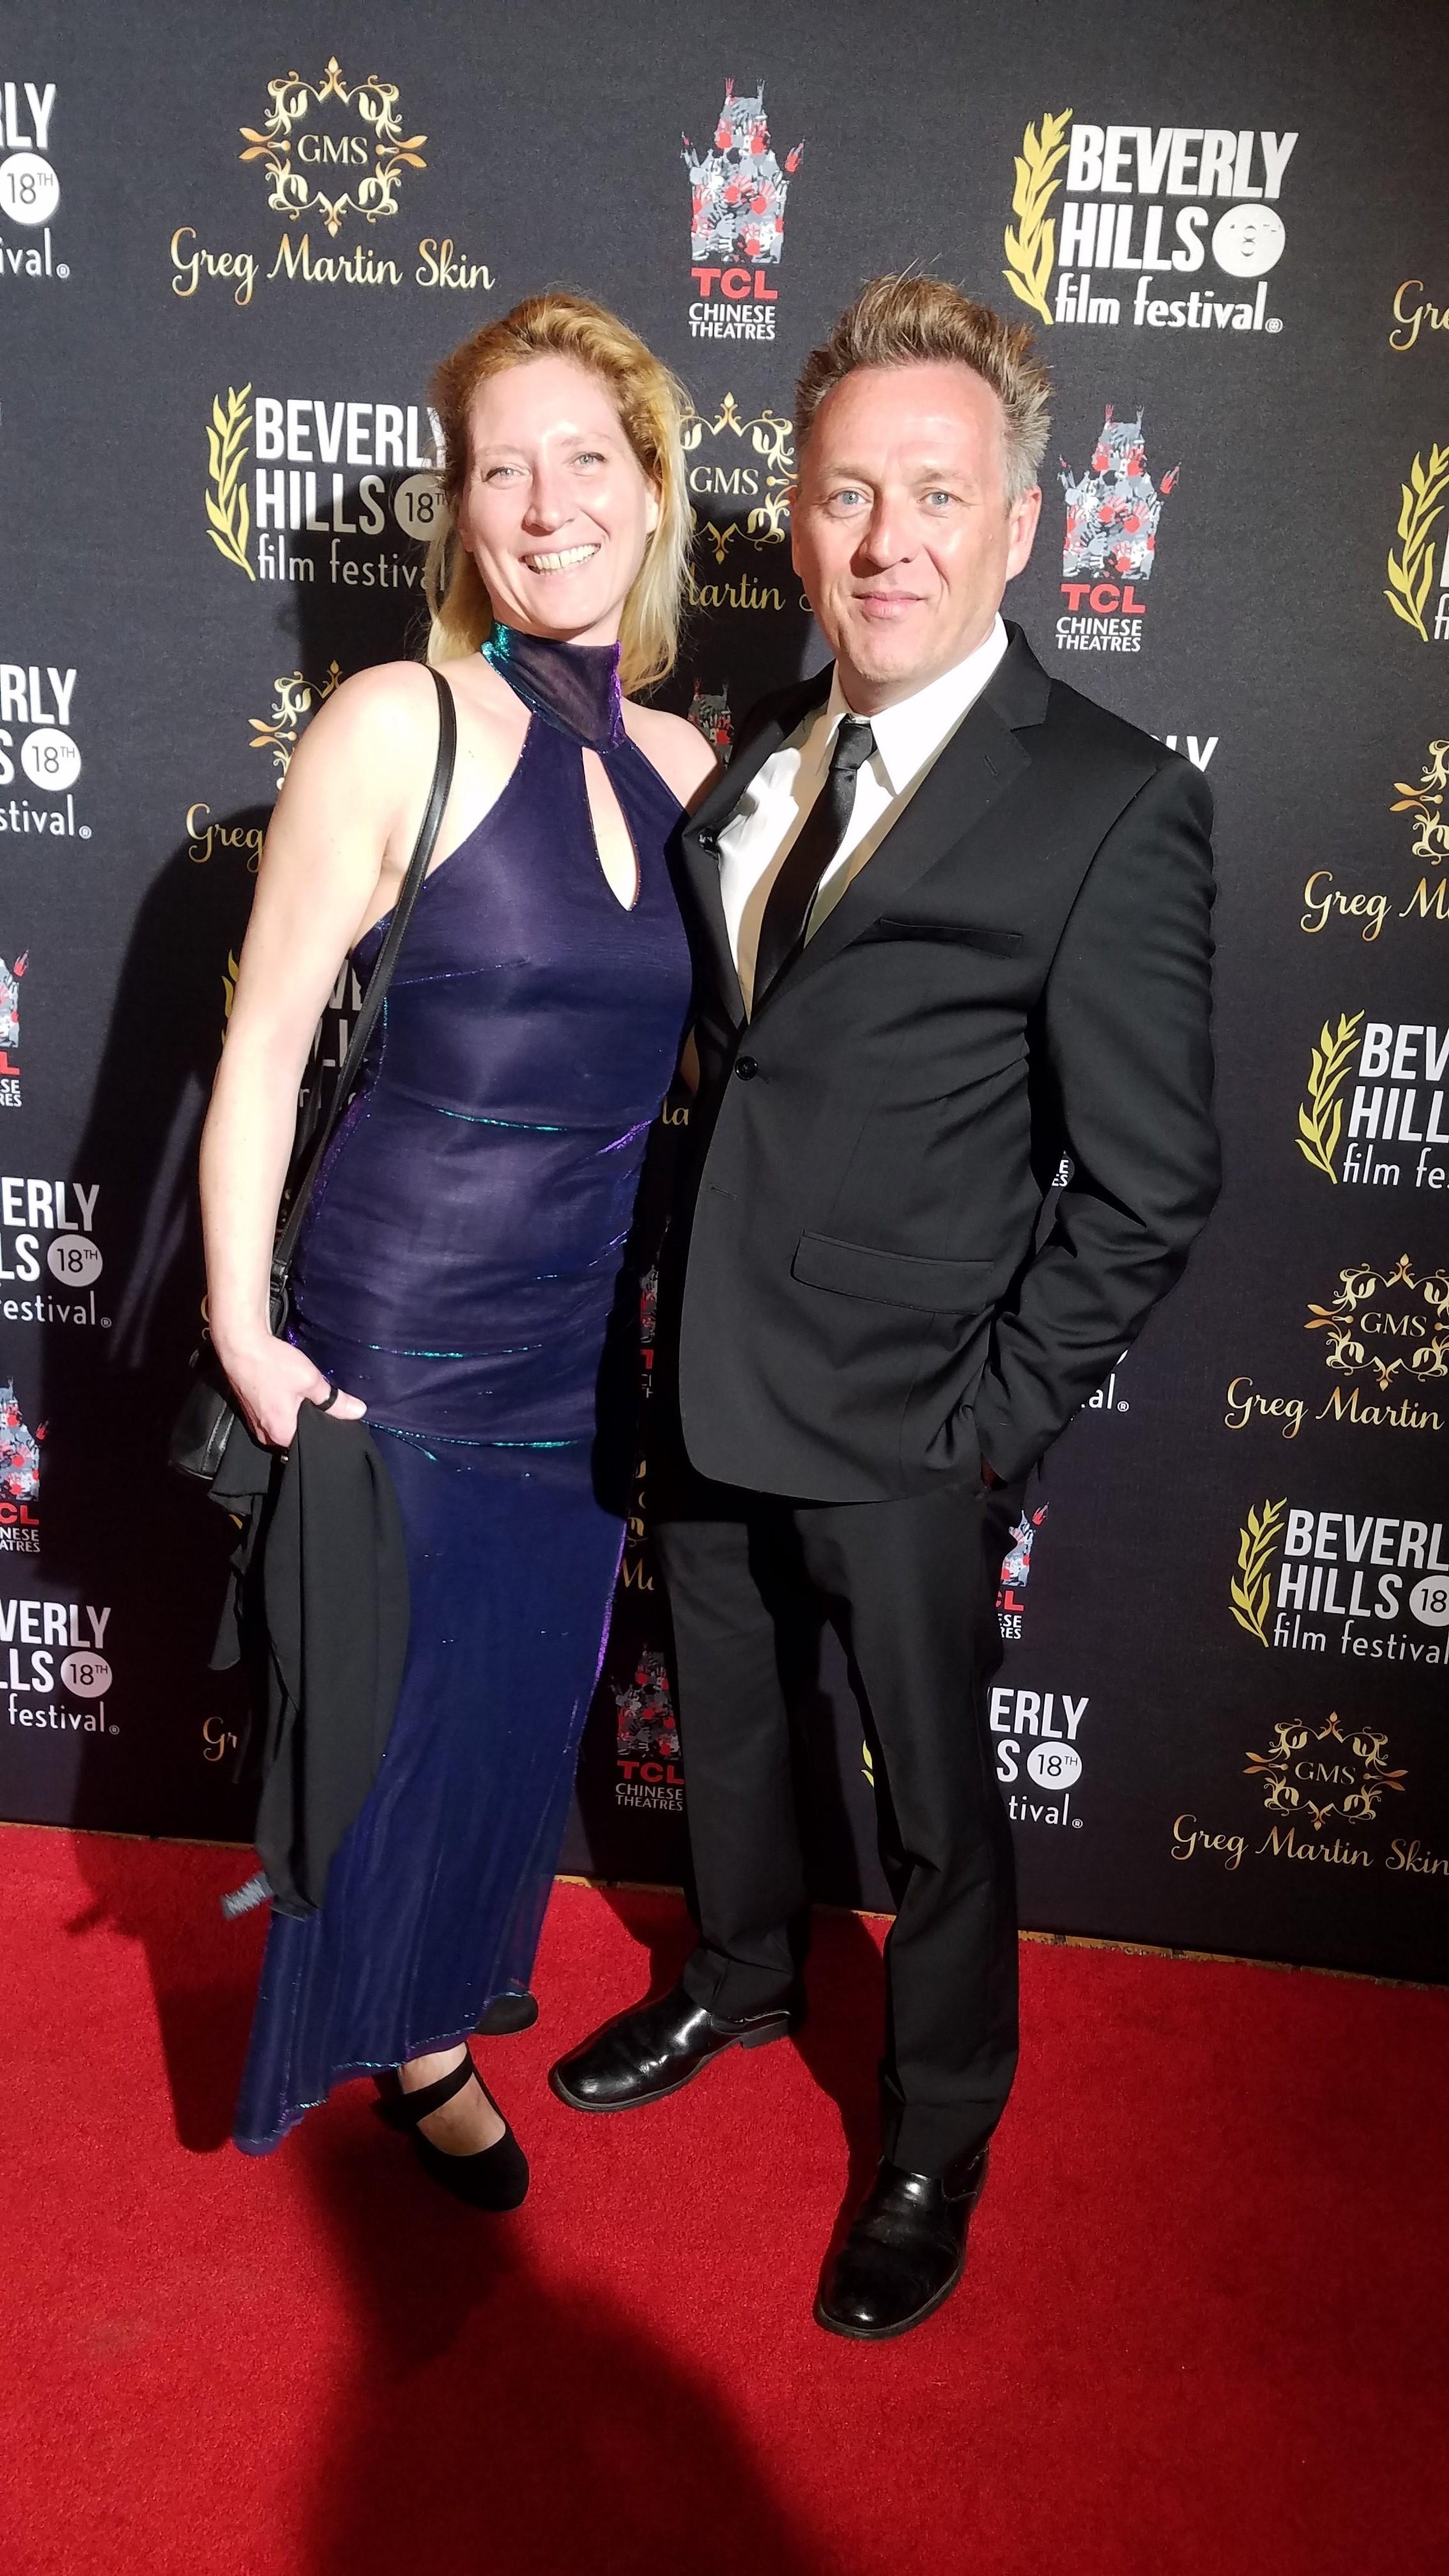 Jennifer Stewart and Joe Toppe at the Beverly Hills Film Festival.